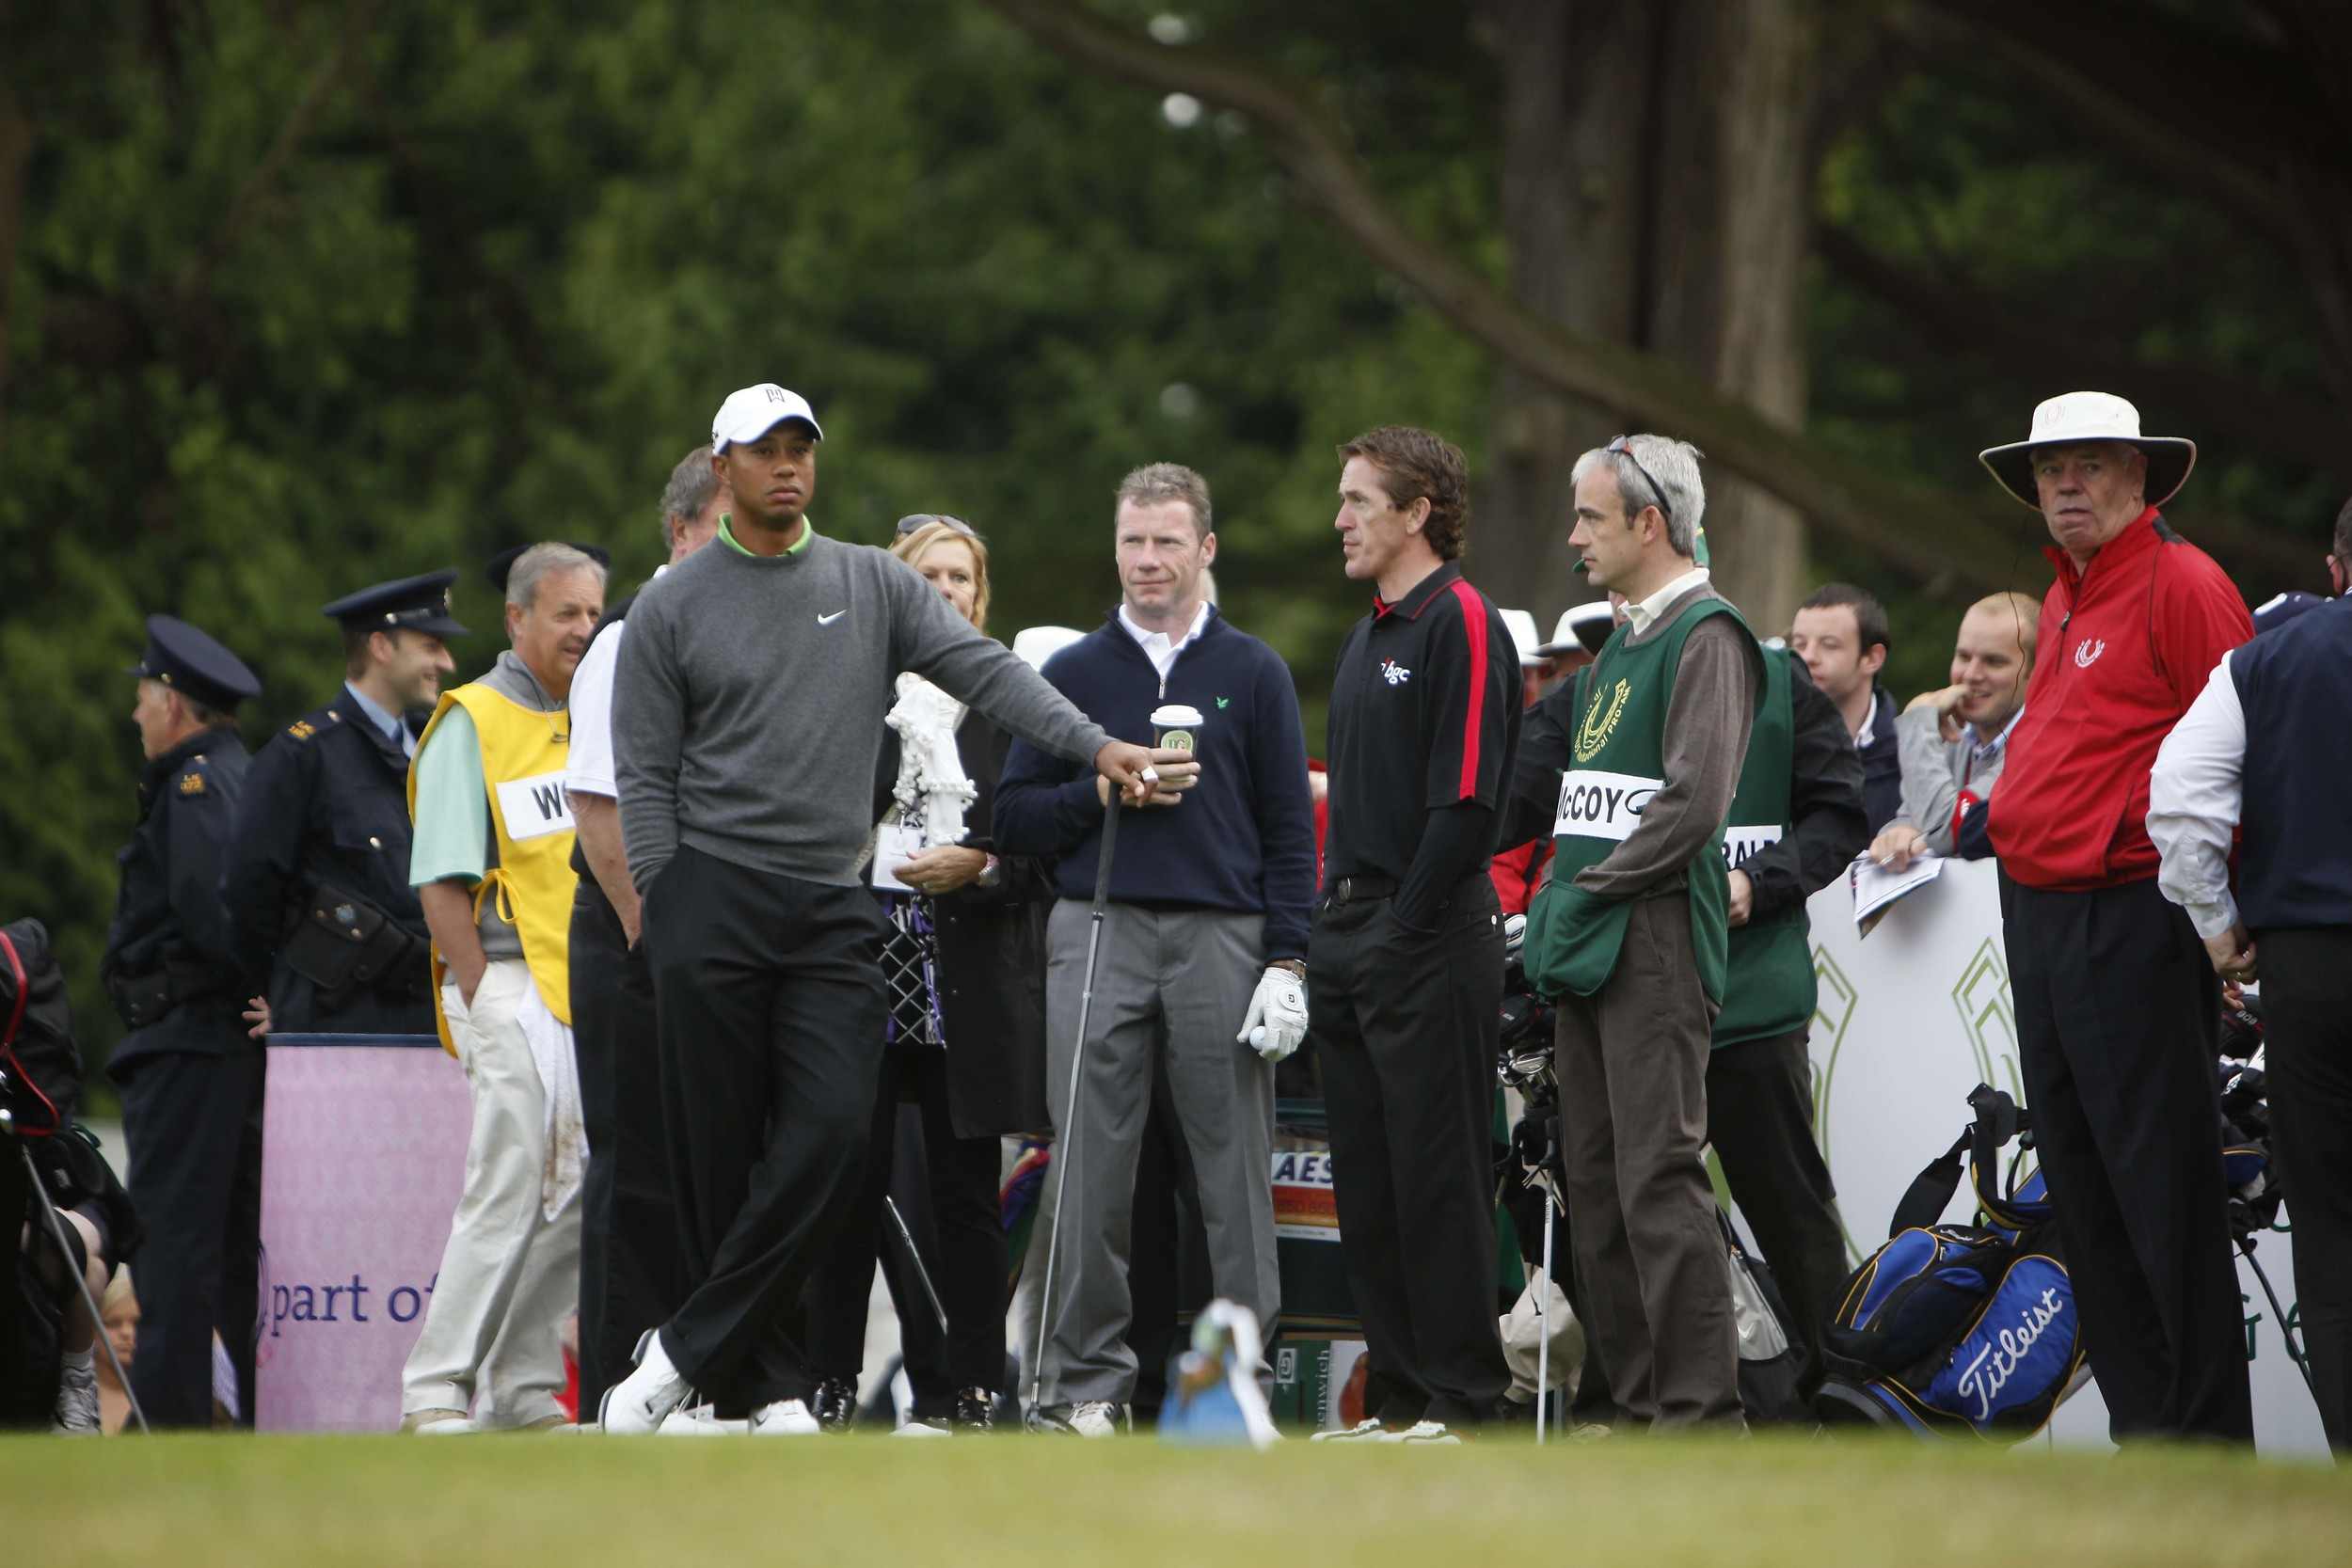 Irish champion jockeys, Mick Fitzgerald, Tony McCoy andRuby Walsh seem star struck by Golfer Tiger Woods at Pro Am